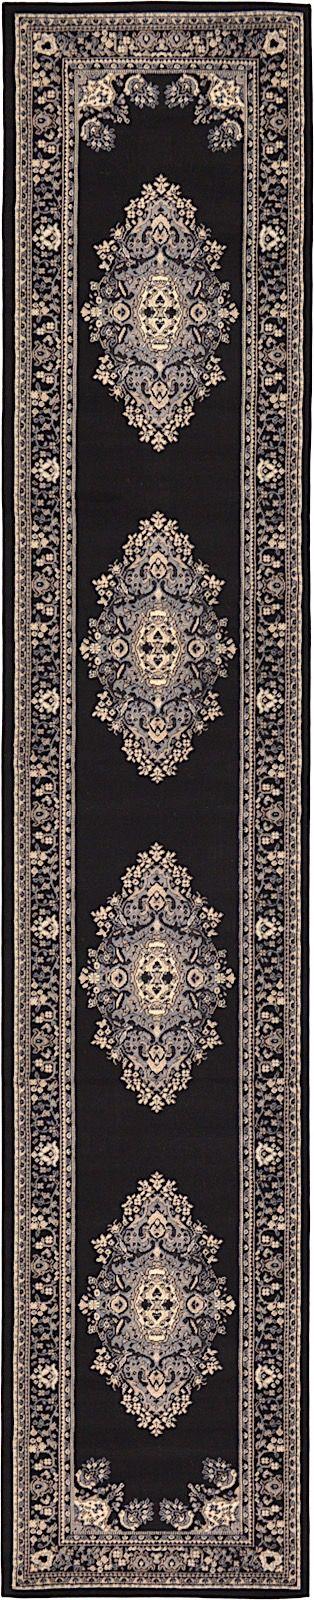 rugpal anahita traditional area rug collection